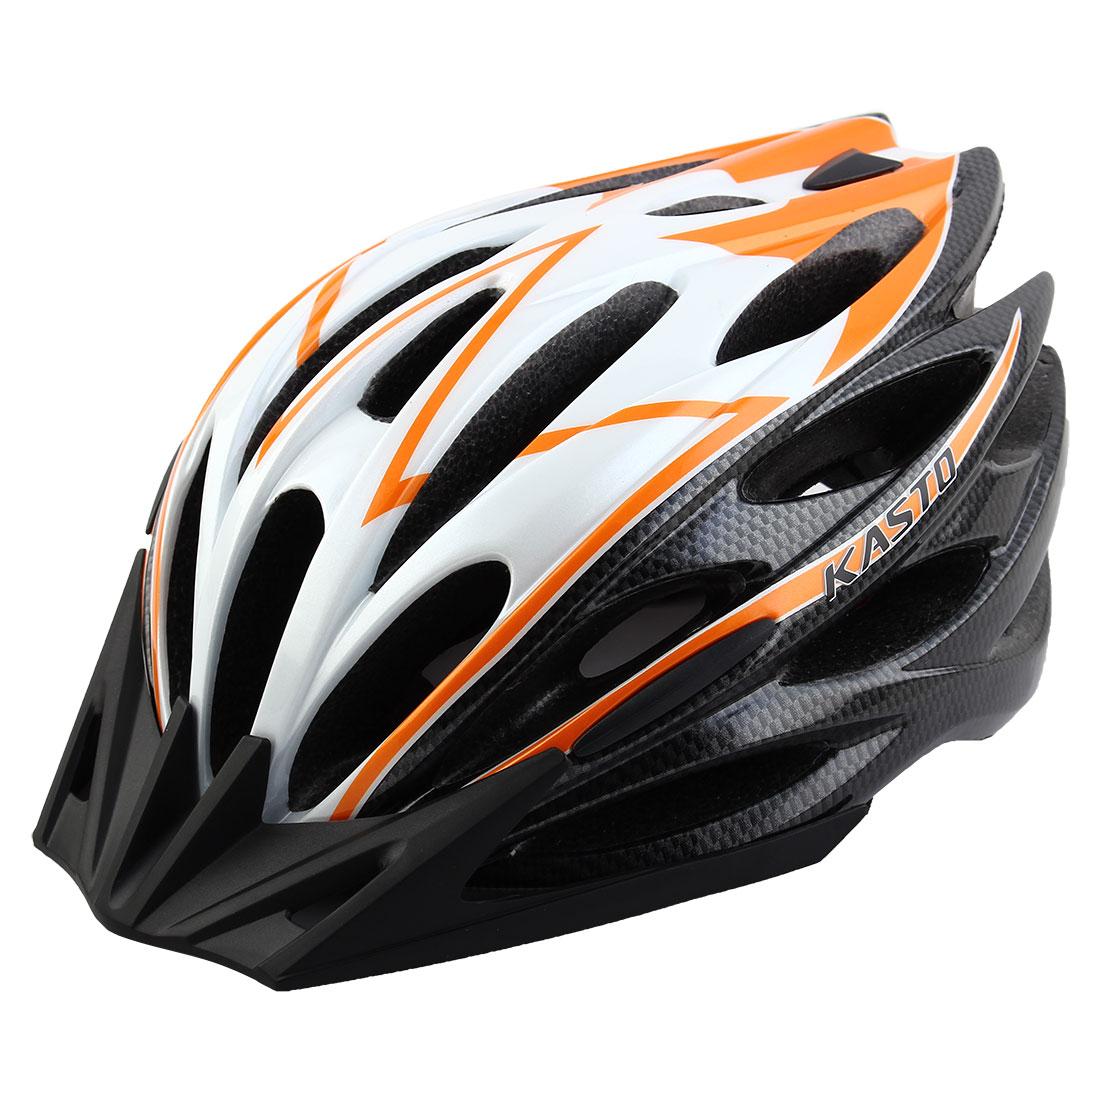 Adult Unisex 25 Holes Rotary Regulator Cycling Cap Head Safety Protector Hat Portable Biking Helmet Orange